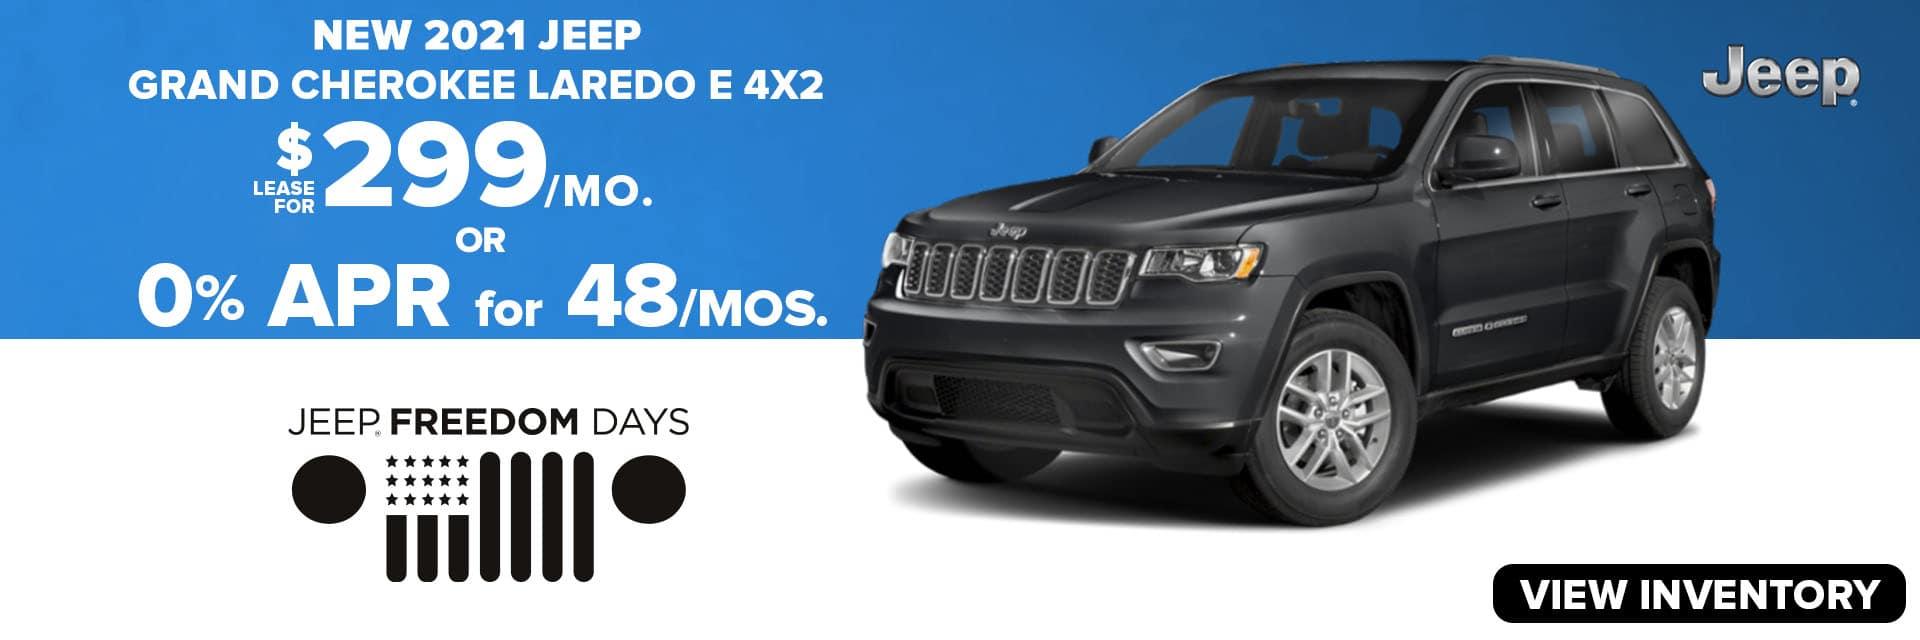 SLCJ-June 2021-2021 Jeep Grand Cherokee copy